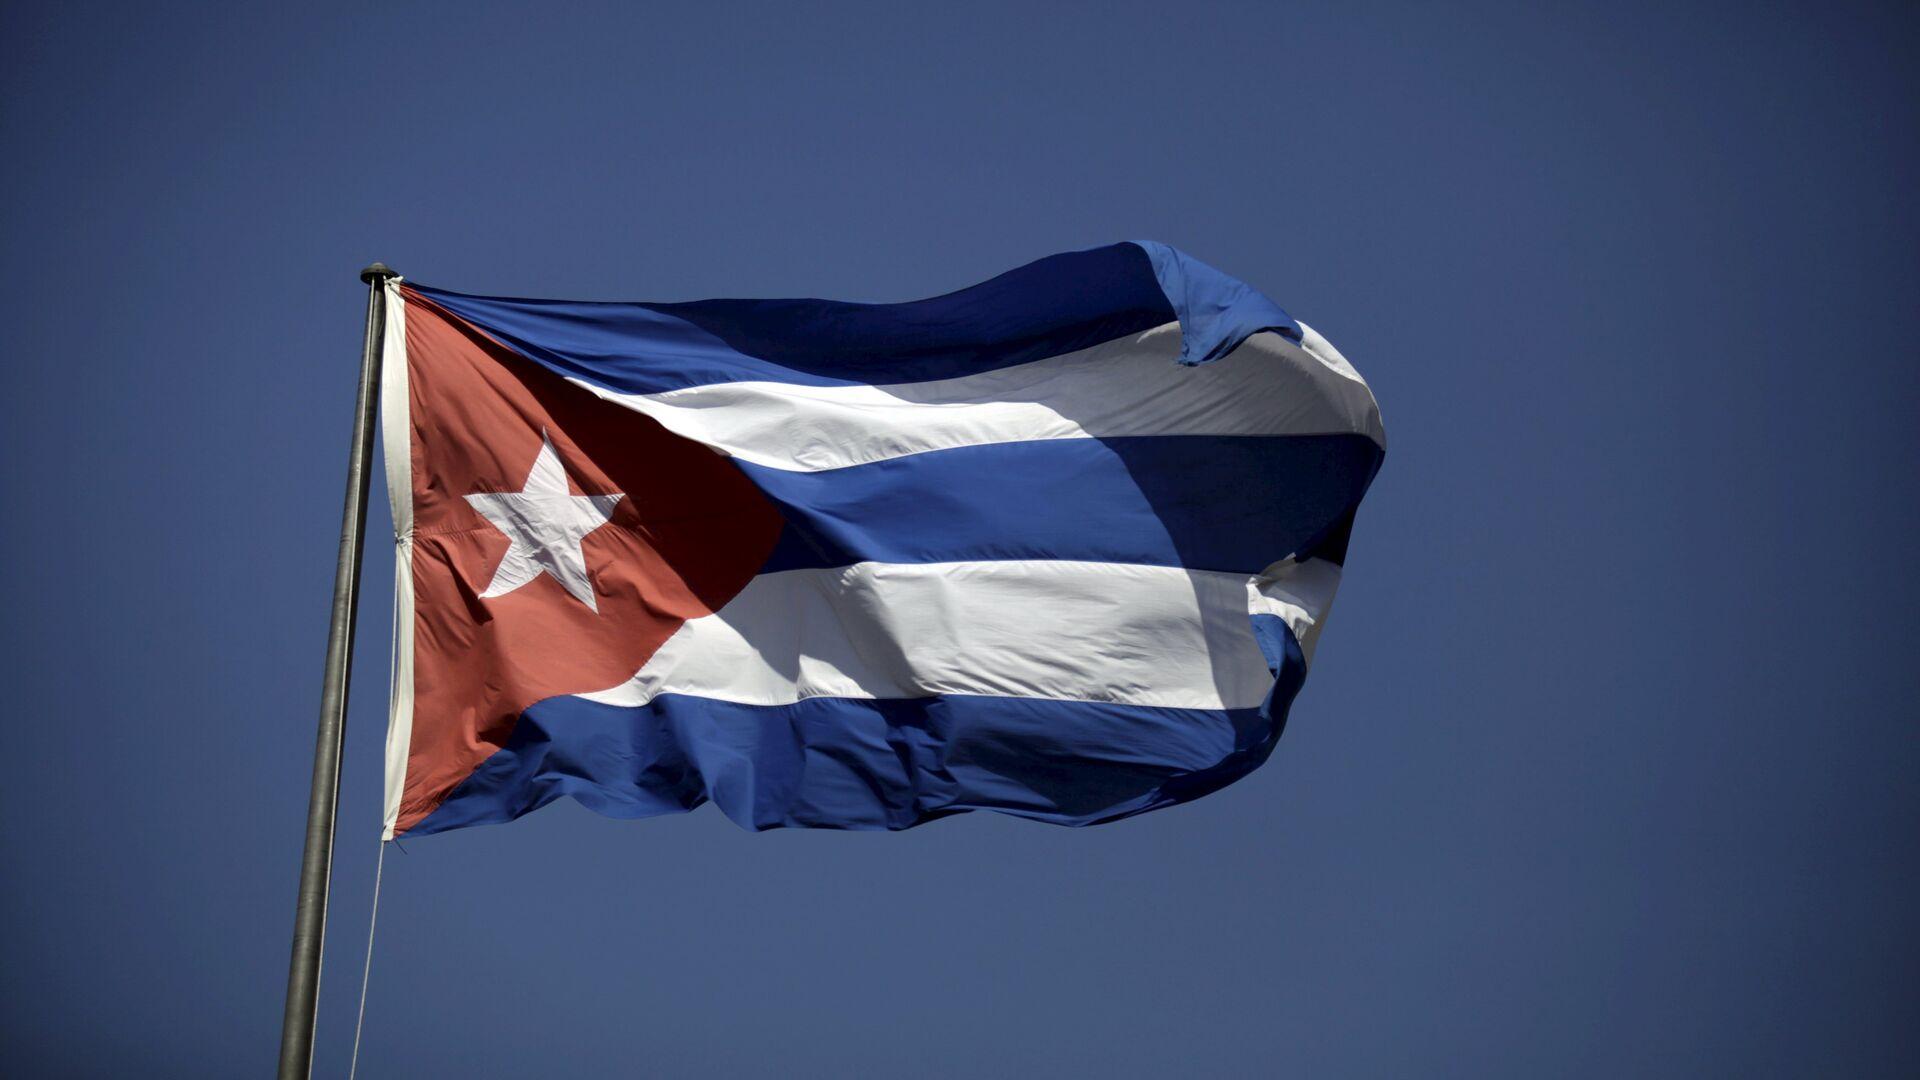 Bandera de Cuba - Sputnik Mundo, 1920, 18.05.2020